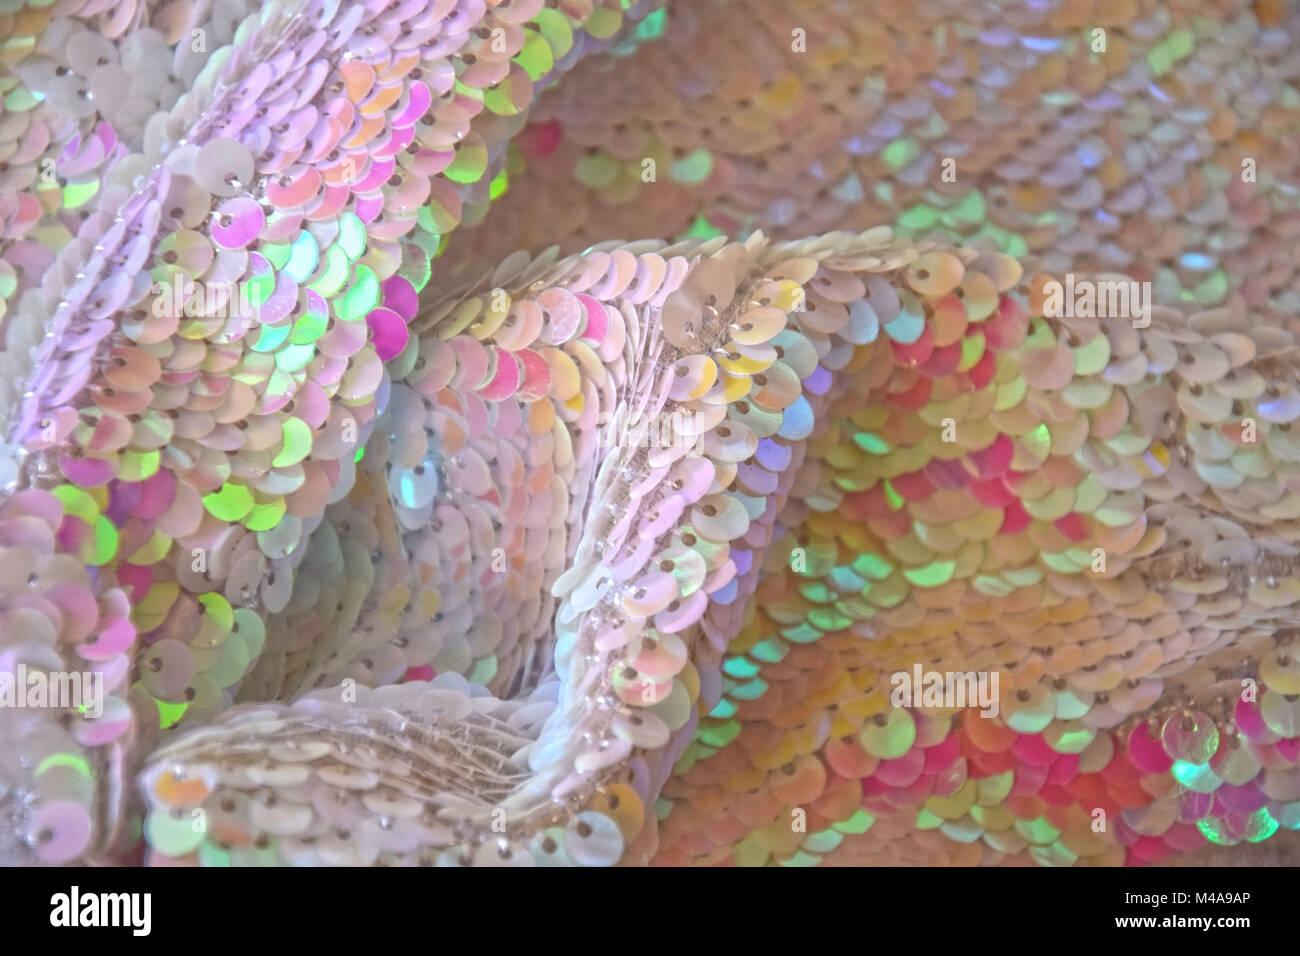 Erfreut Meerjungfrau Färbung Seite Fotos - Entry Level Resume ...